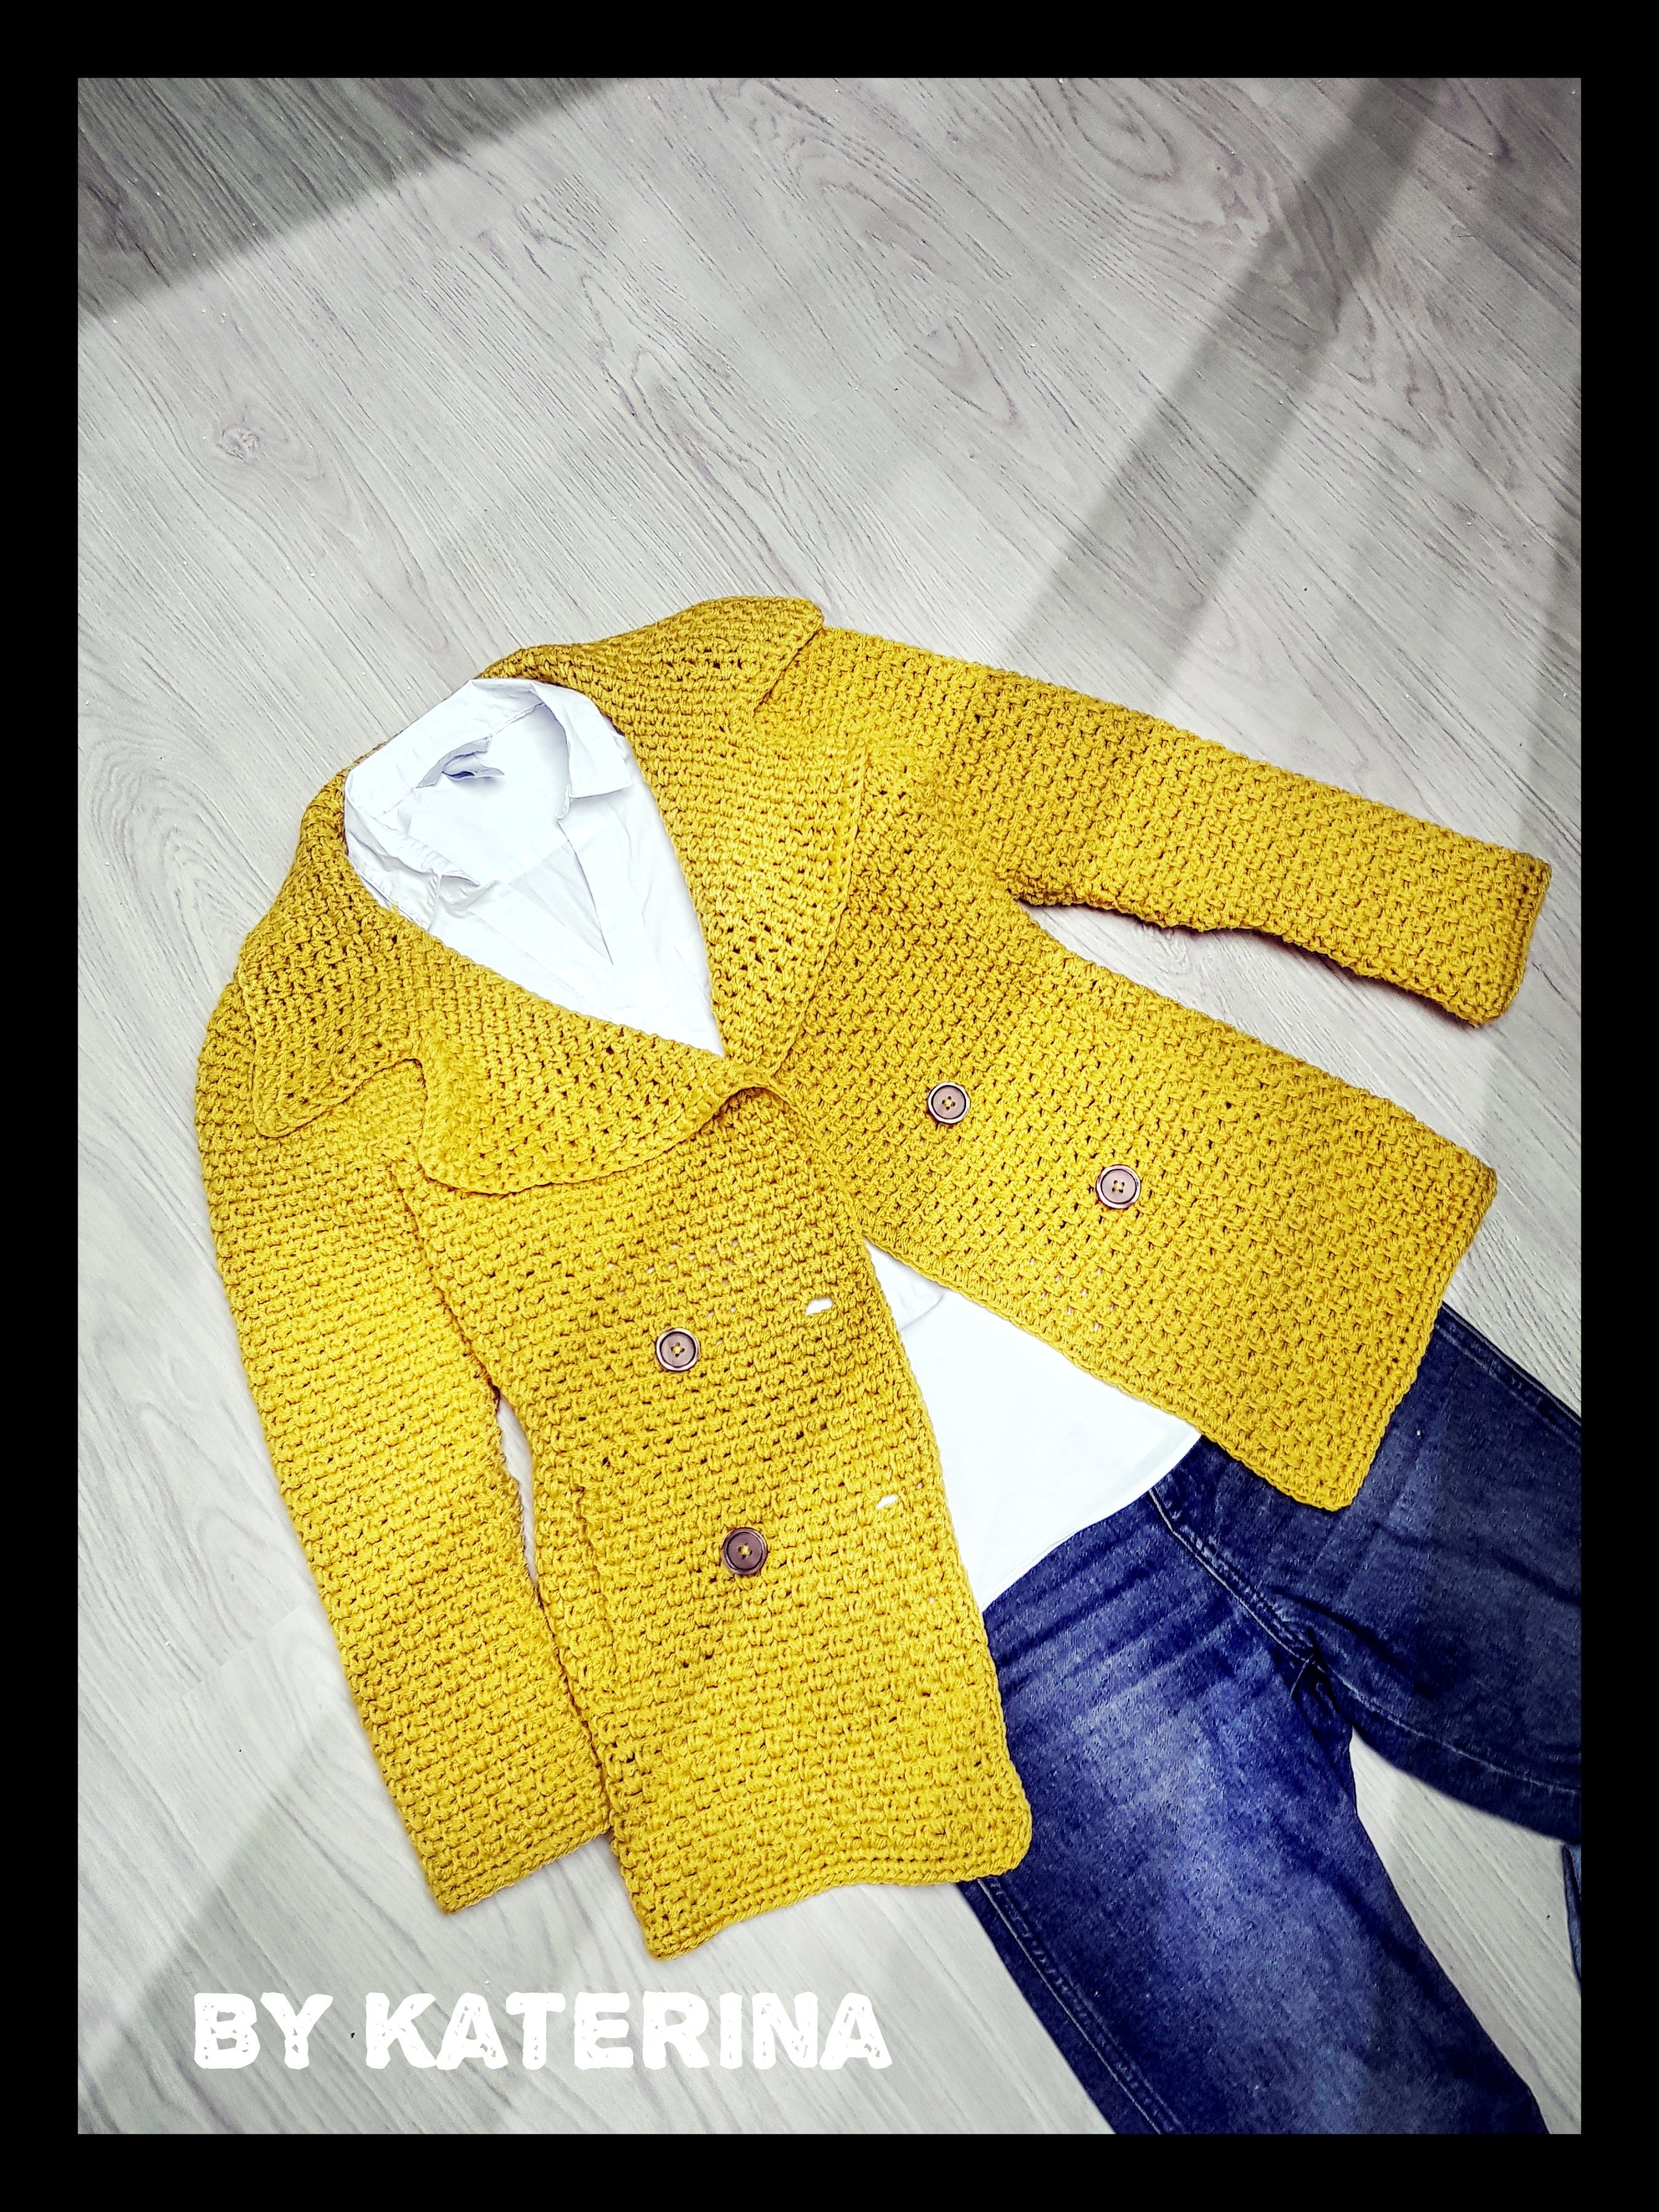 Mossy jacket free pattern crochet winter wear pinterest mossy jacket free pattern bankloansurffo Image collections